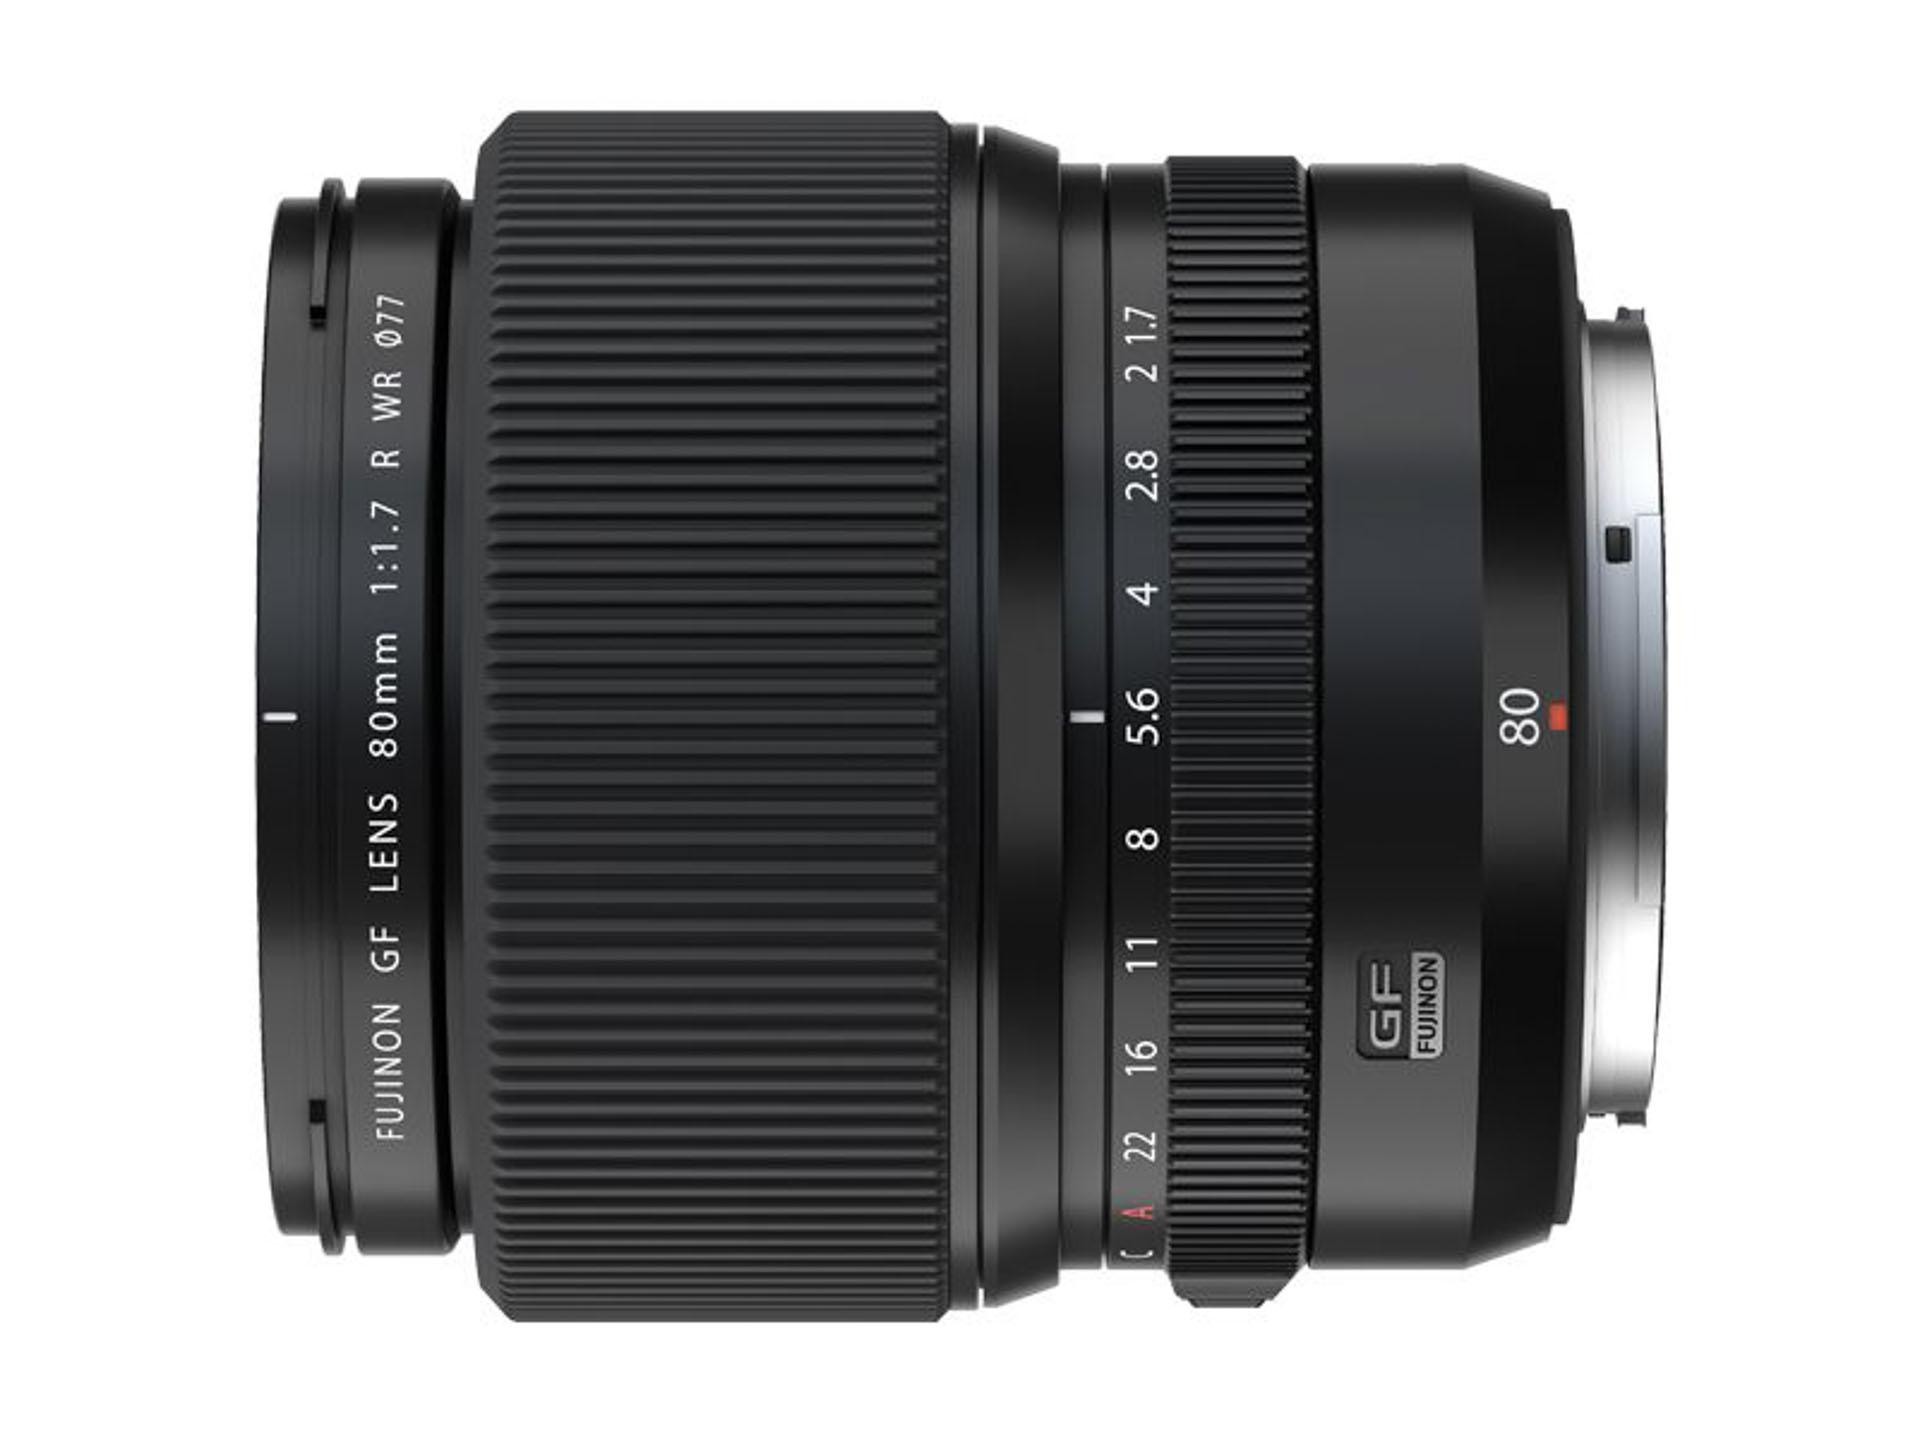 GF80mm f1.7 side view